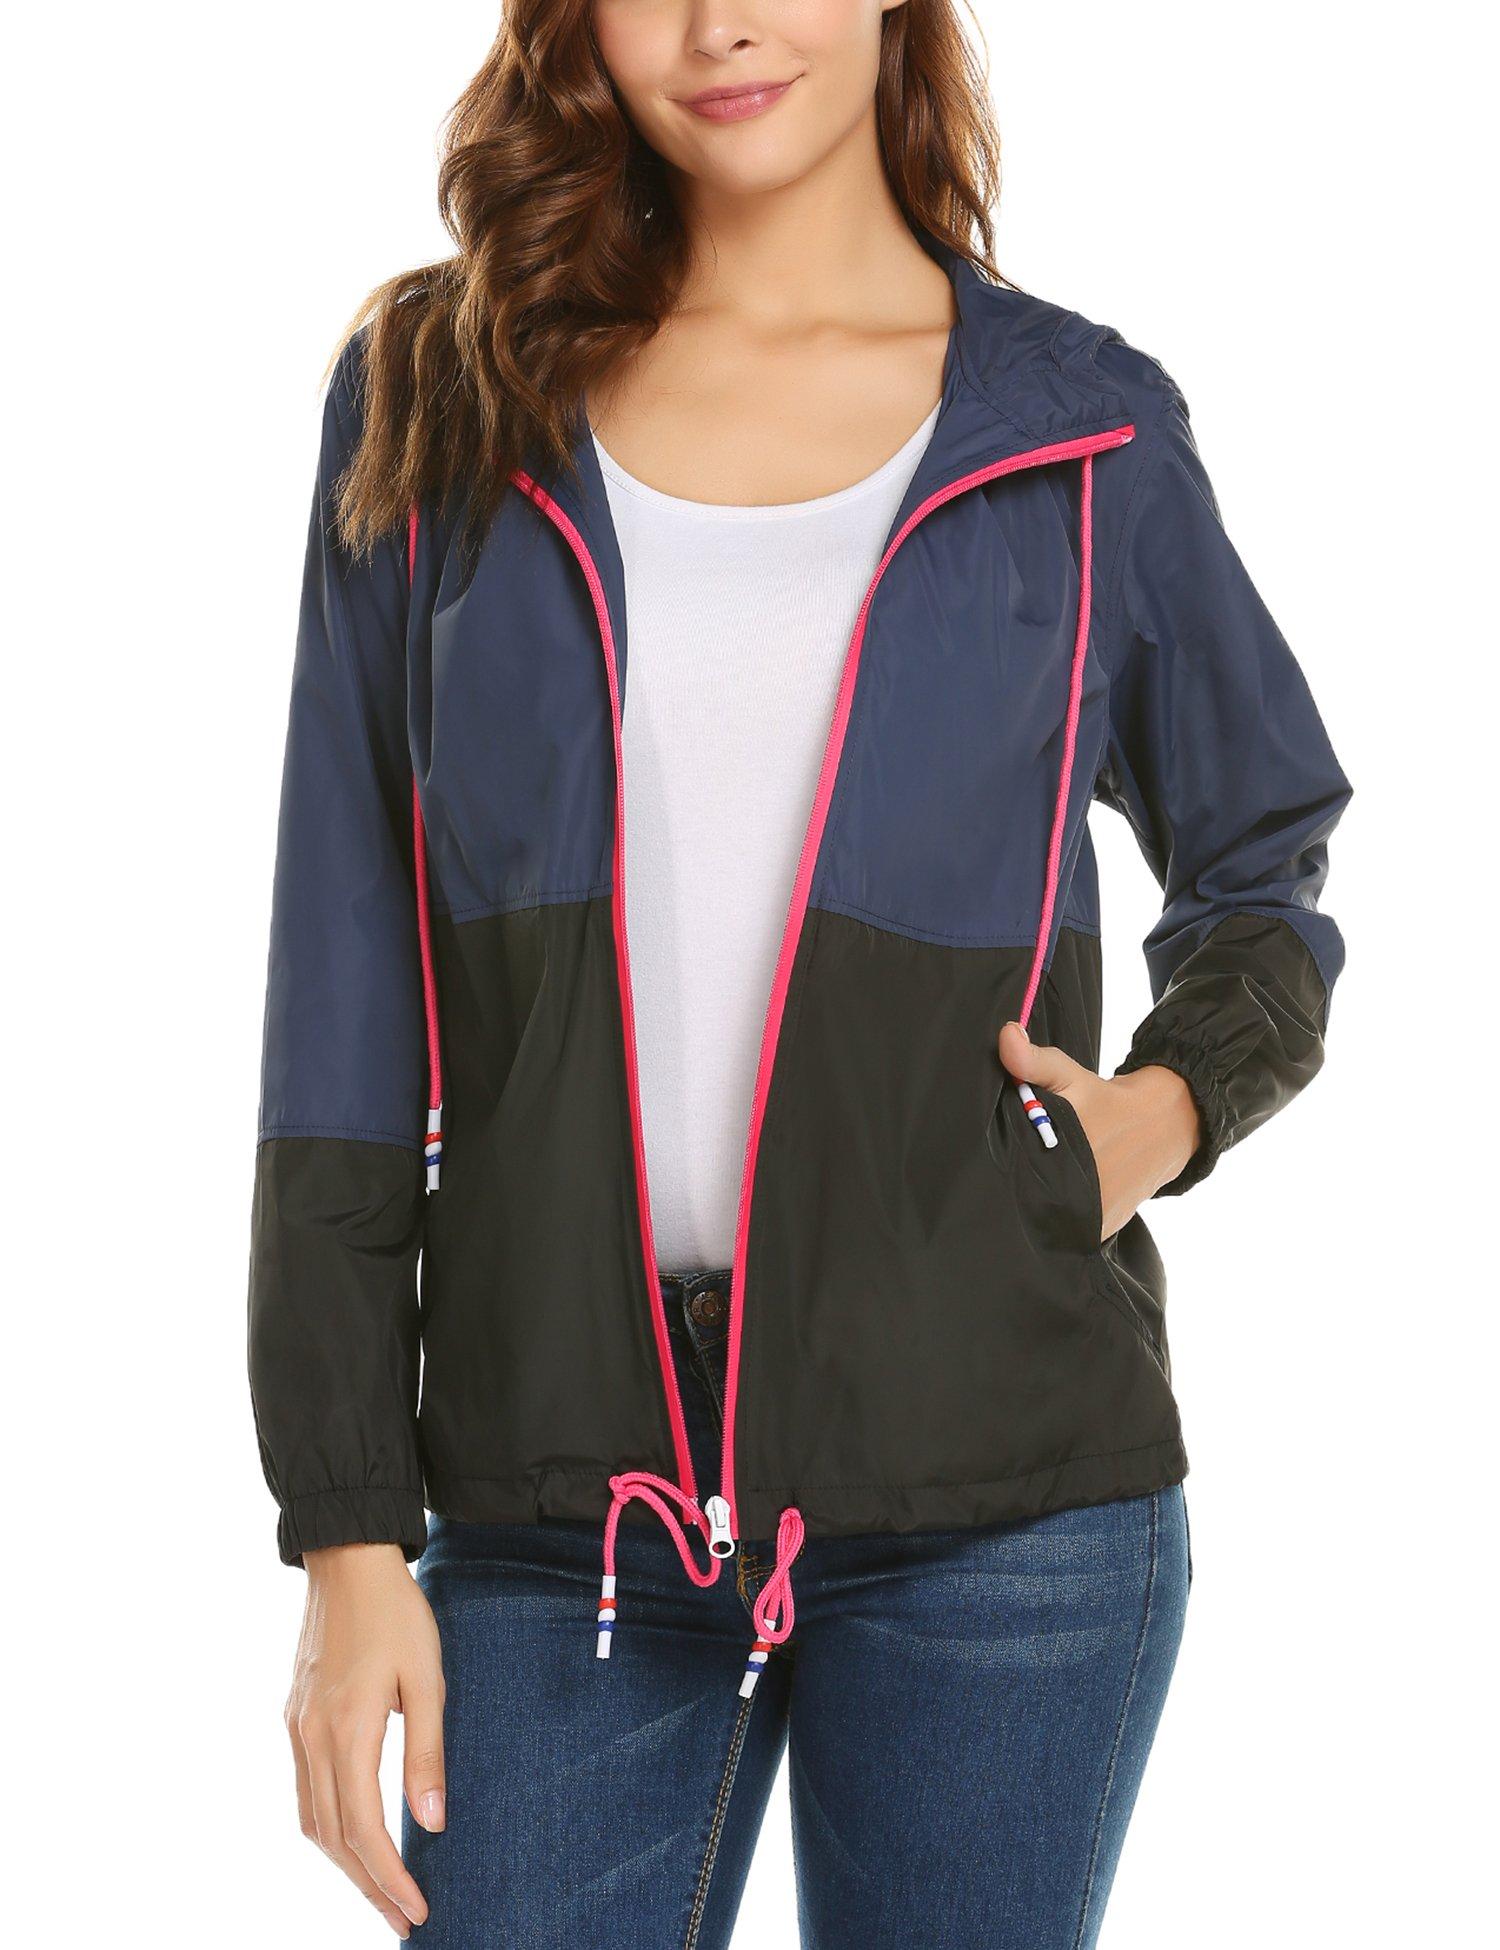 ZHENWEI Waterproof Lightweight Rain Jacket Active Outdoor Hooded Women's Rain Coat Navy Blue XXL